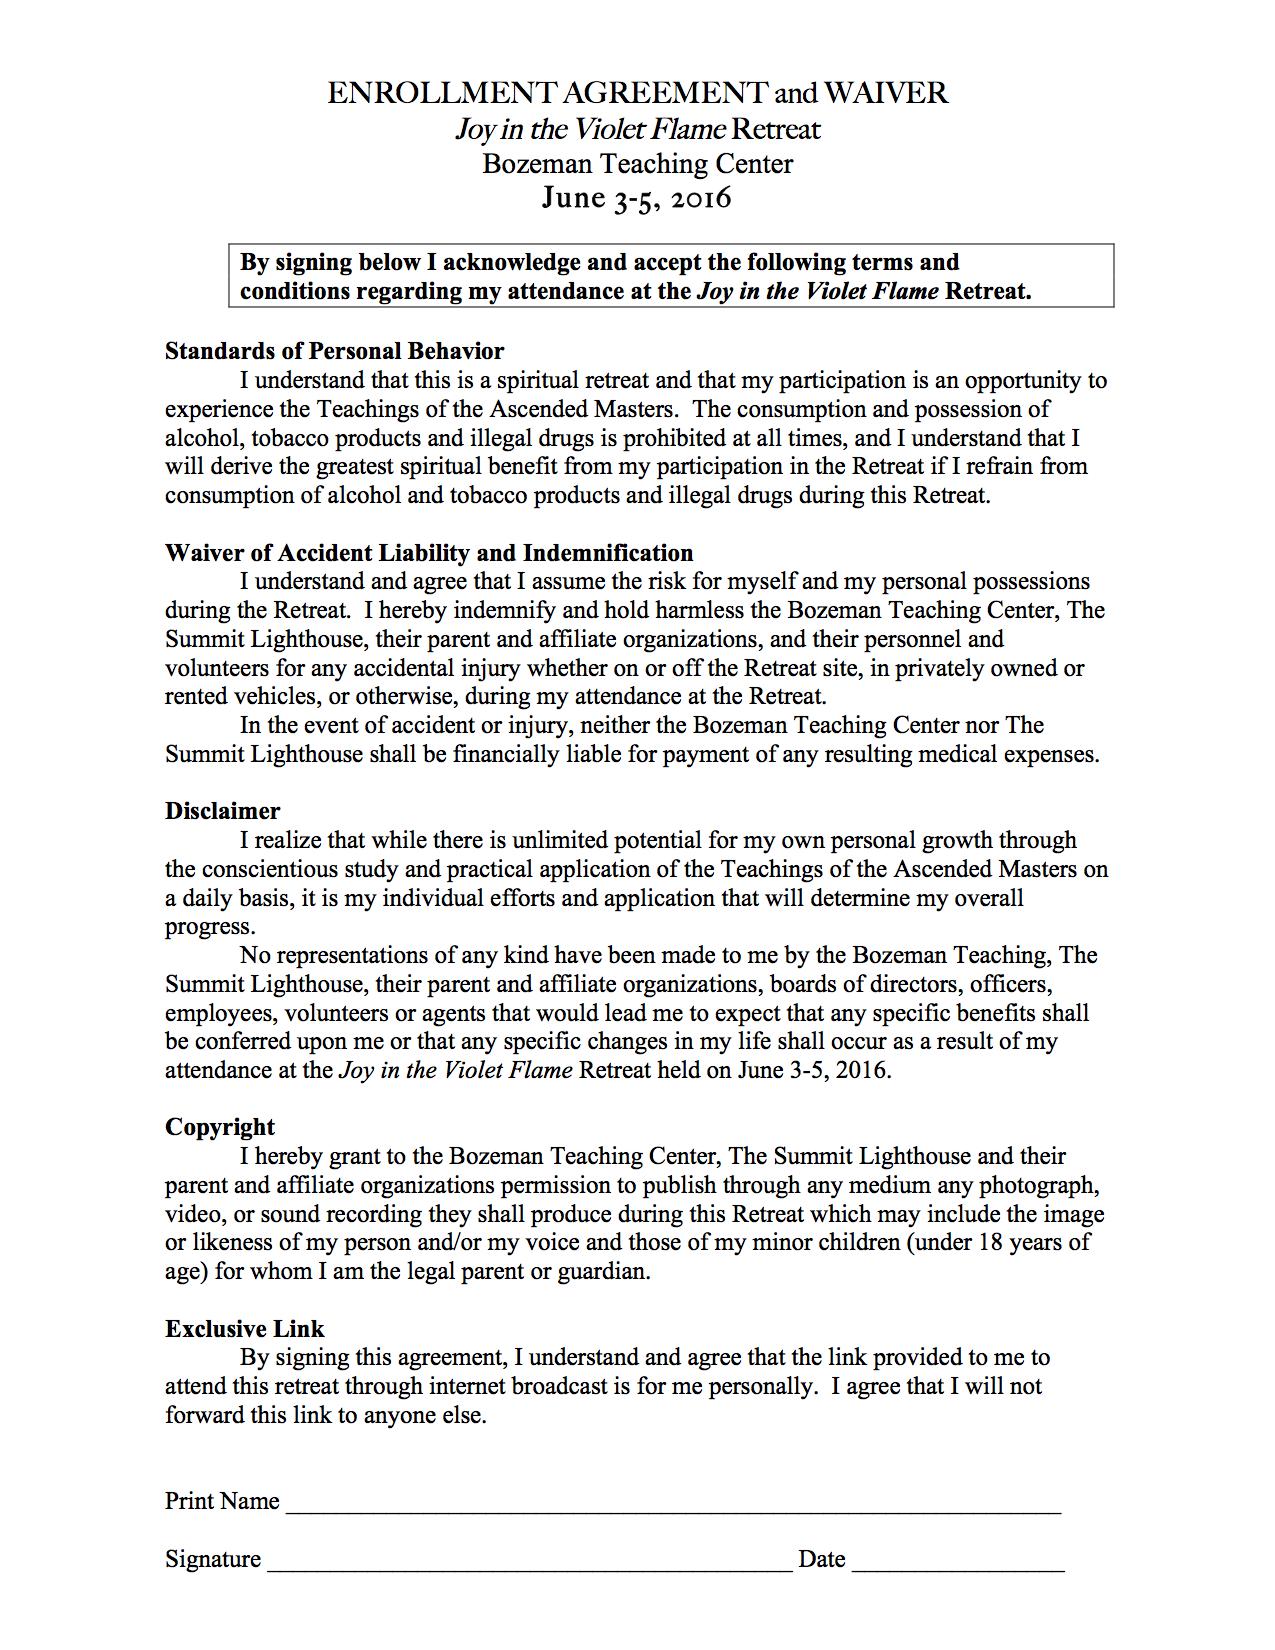 Enrollment Agreement And Waiver Form Bozeman Community Teaching Center